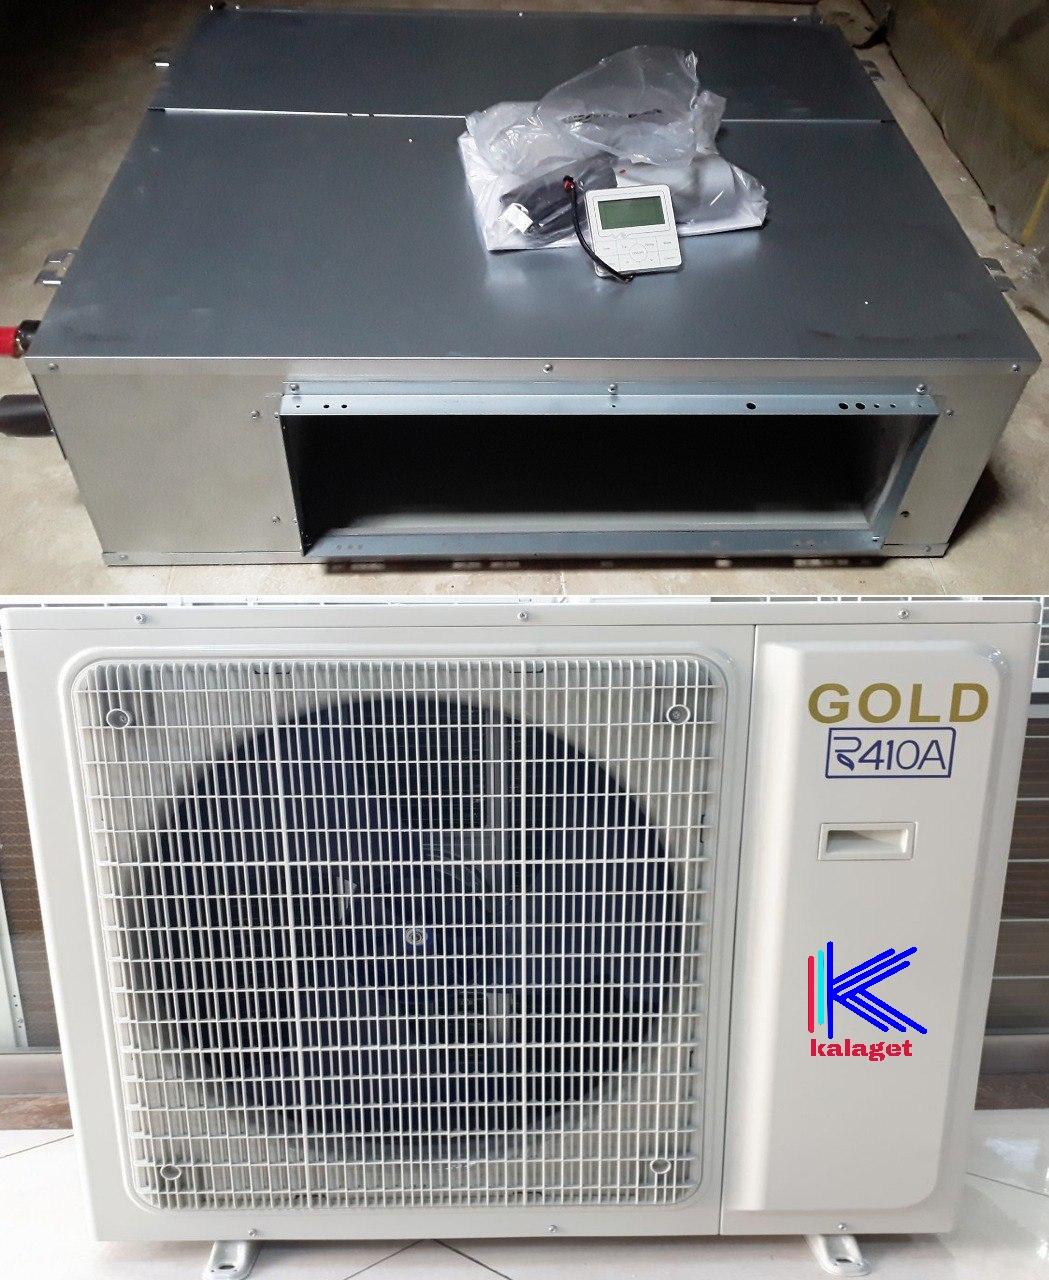 کولرگازی داکت اسپیلت ظرفیت 24000 GOLD